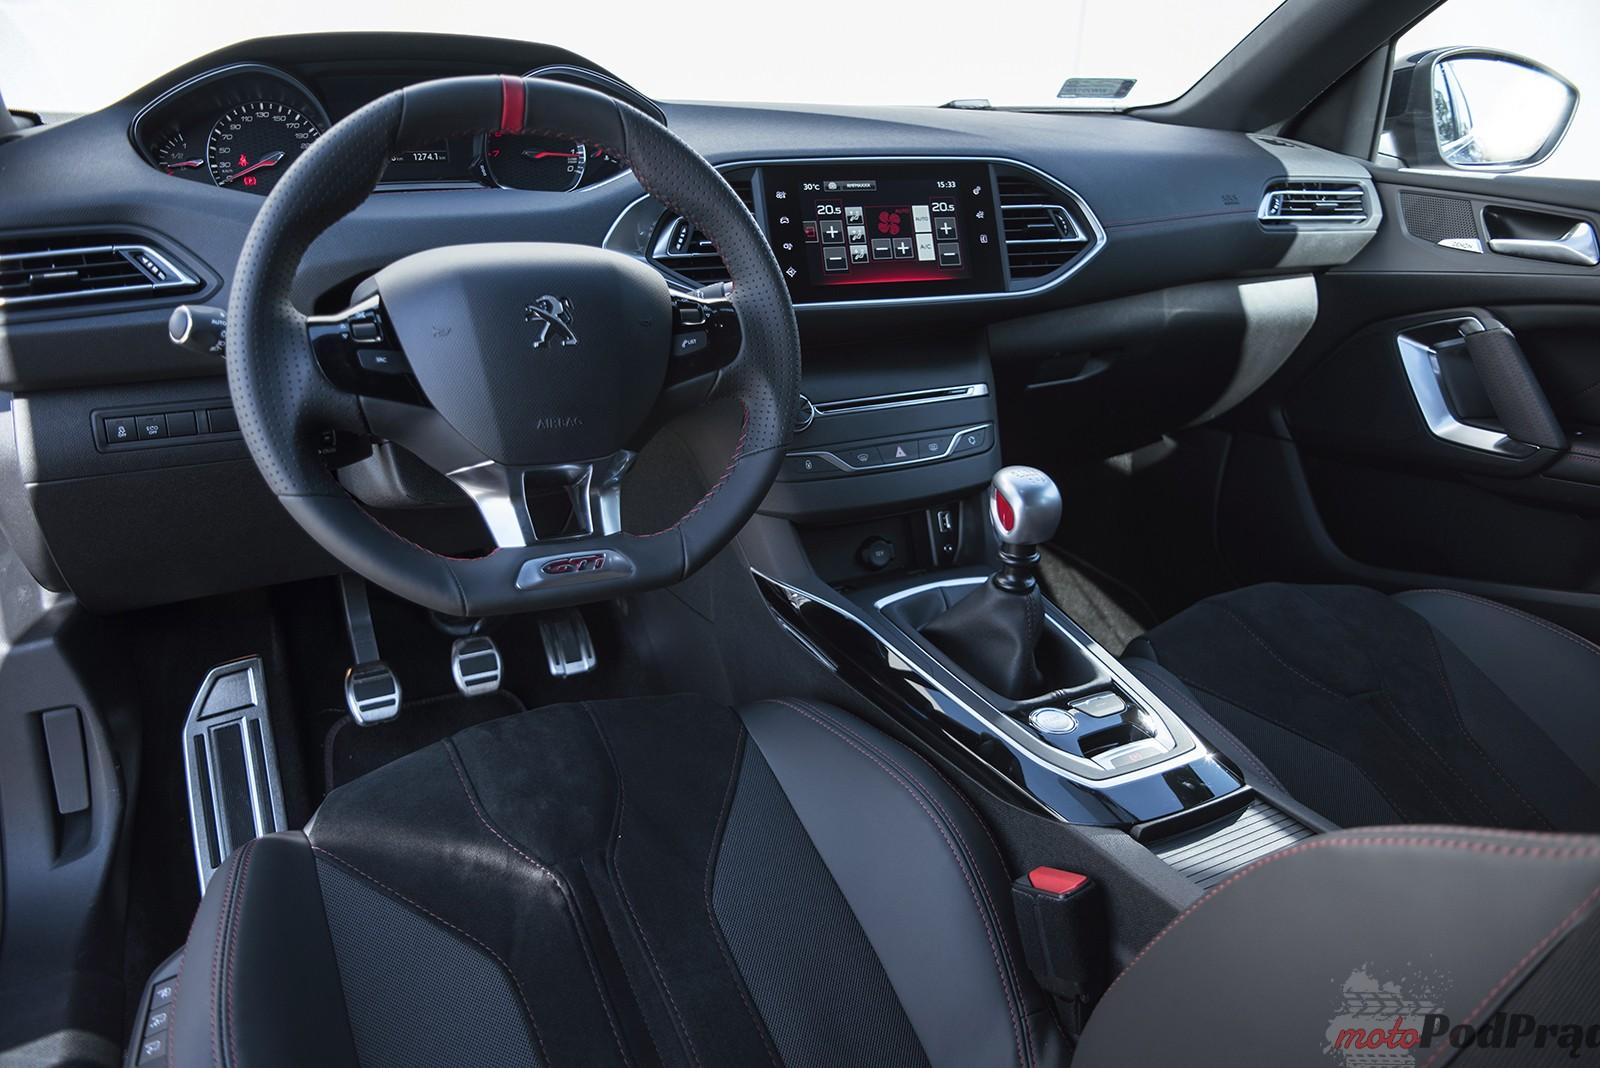 Peugeot 308 GTi 14 Test: Peugeot 308 GTi   potrafi przycisnąć